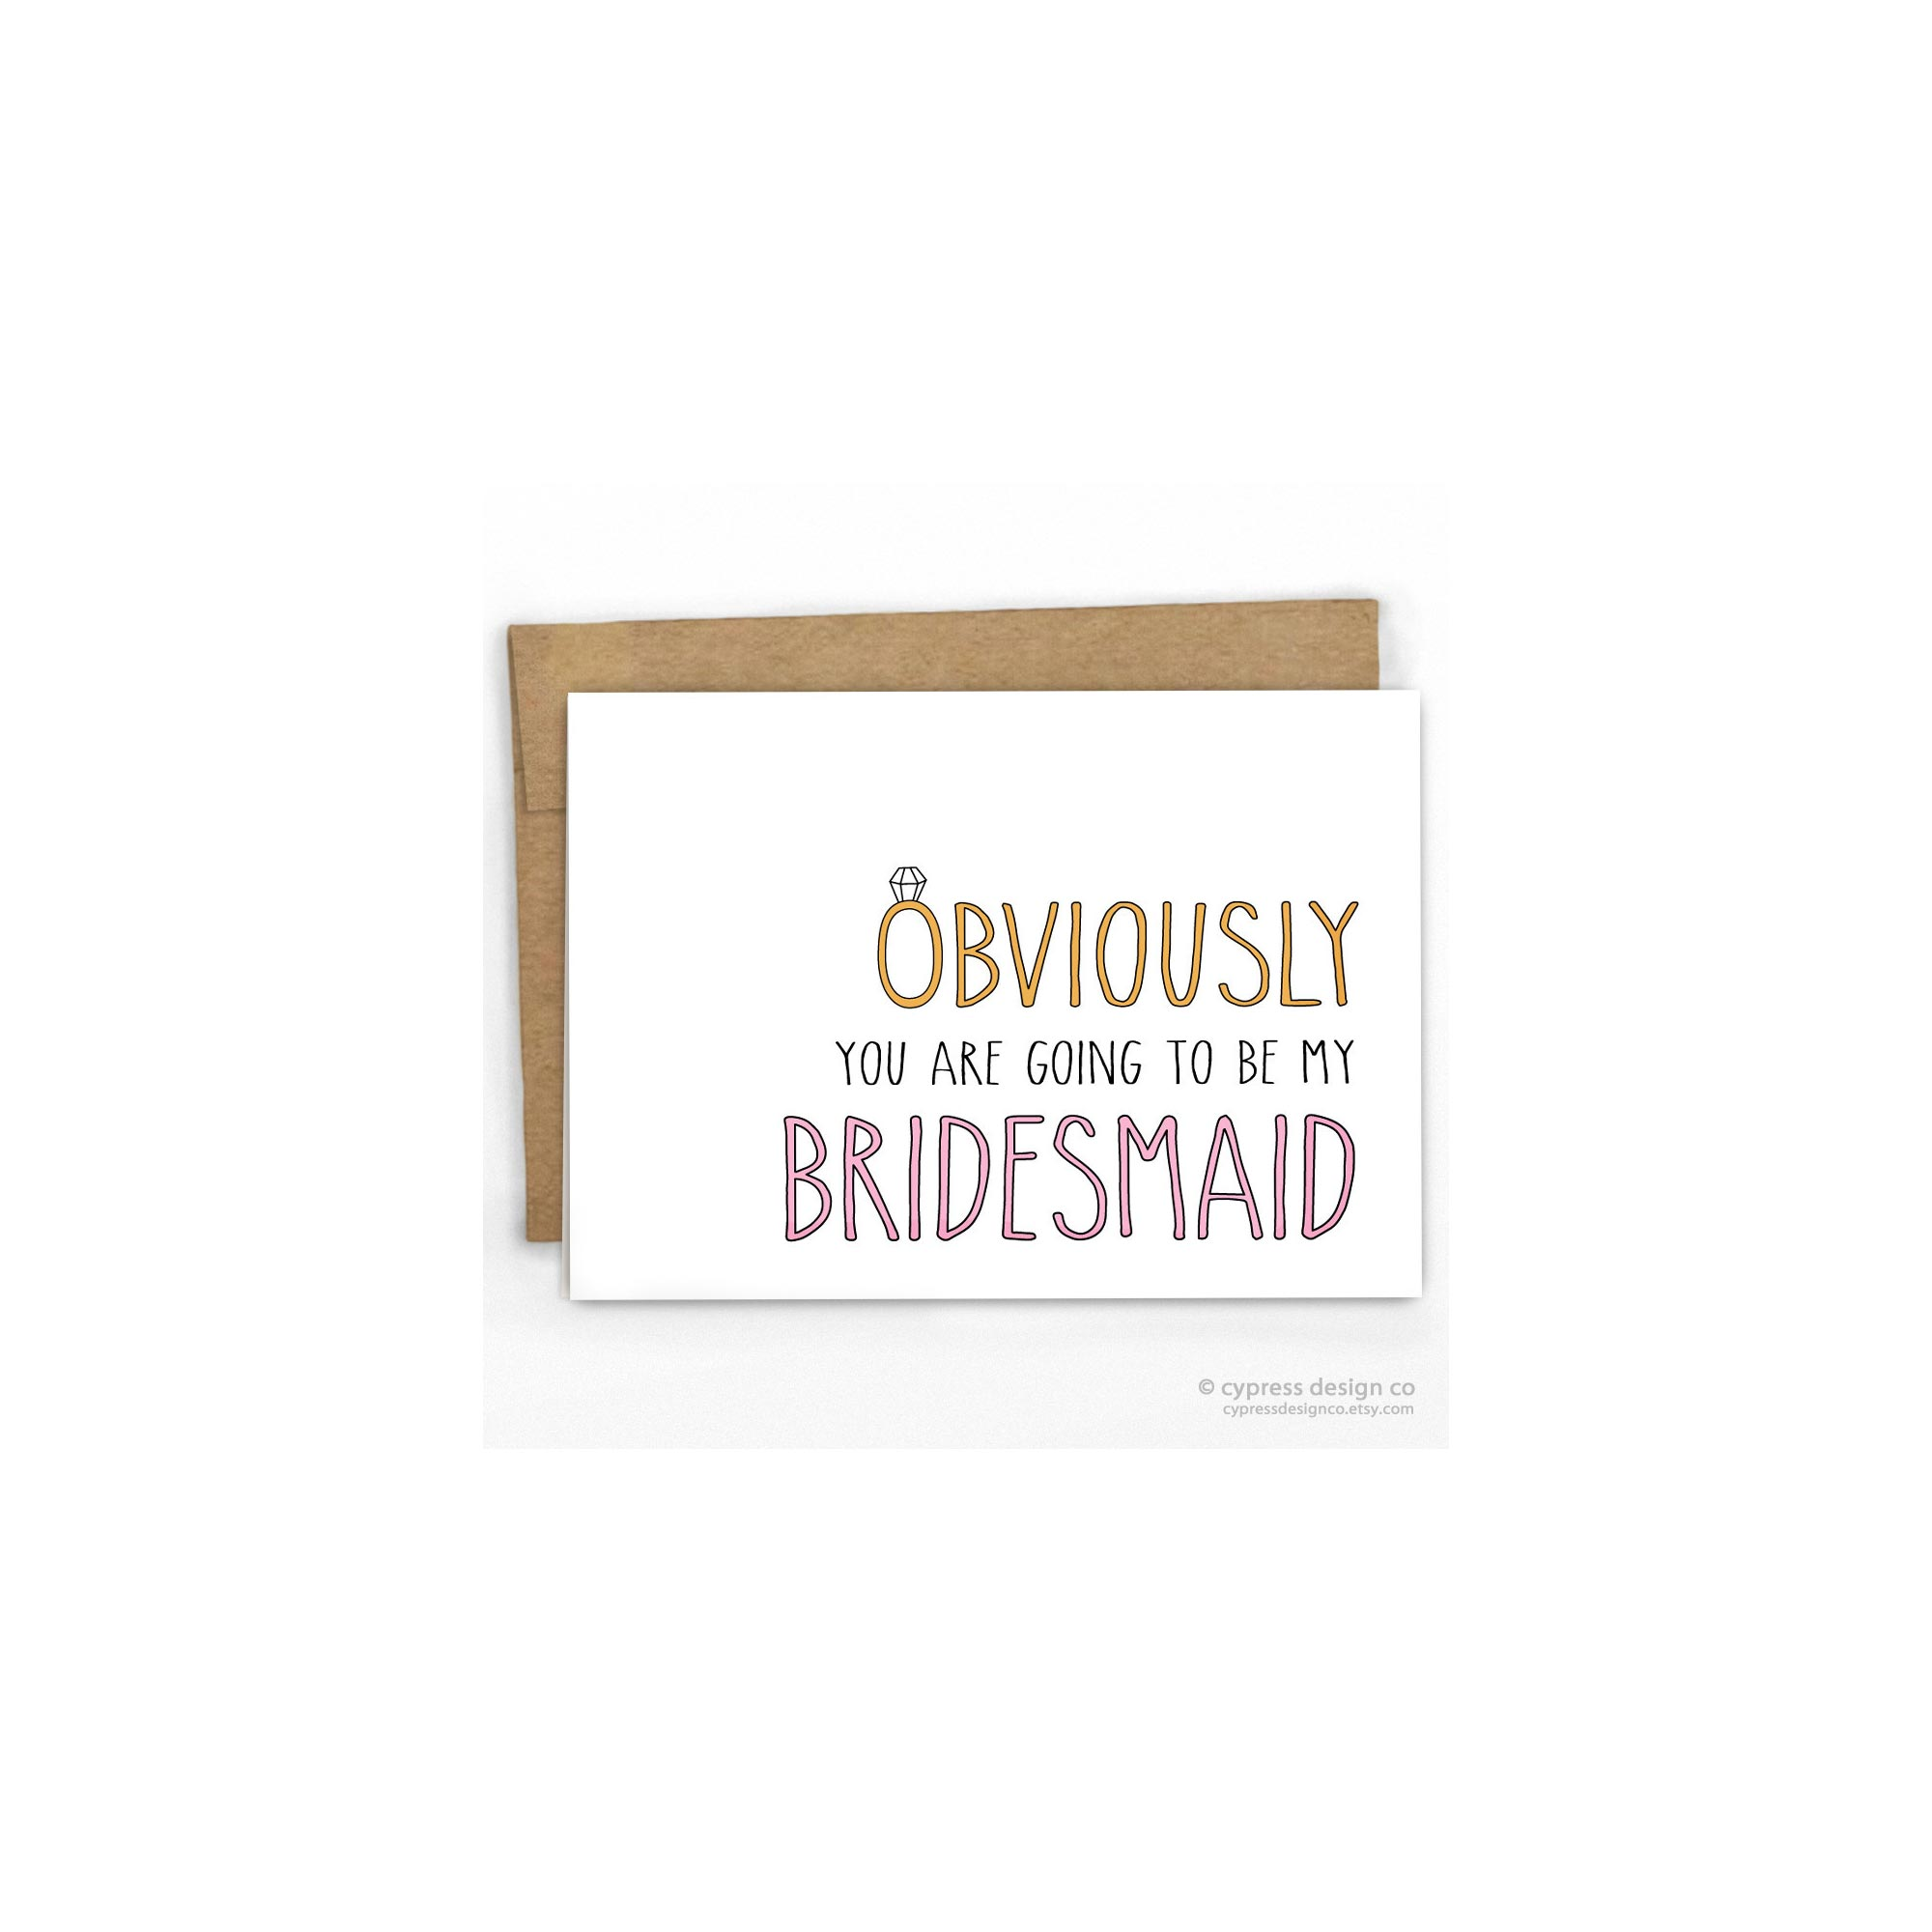 cypress-card-company-will-you-be-my-bridesmaid-card-0216.jpg